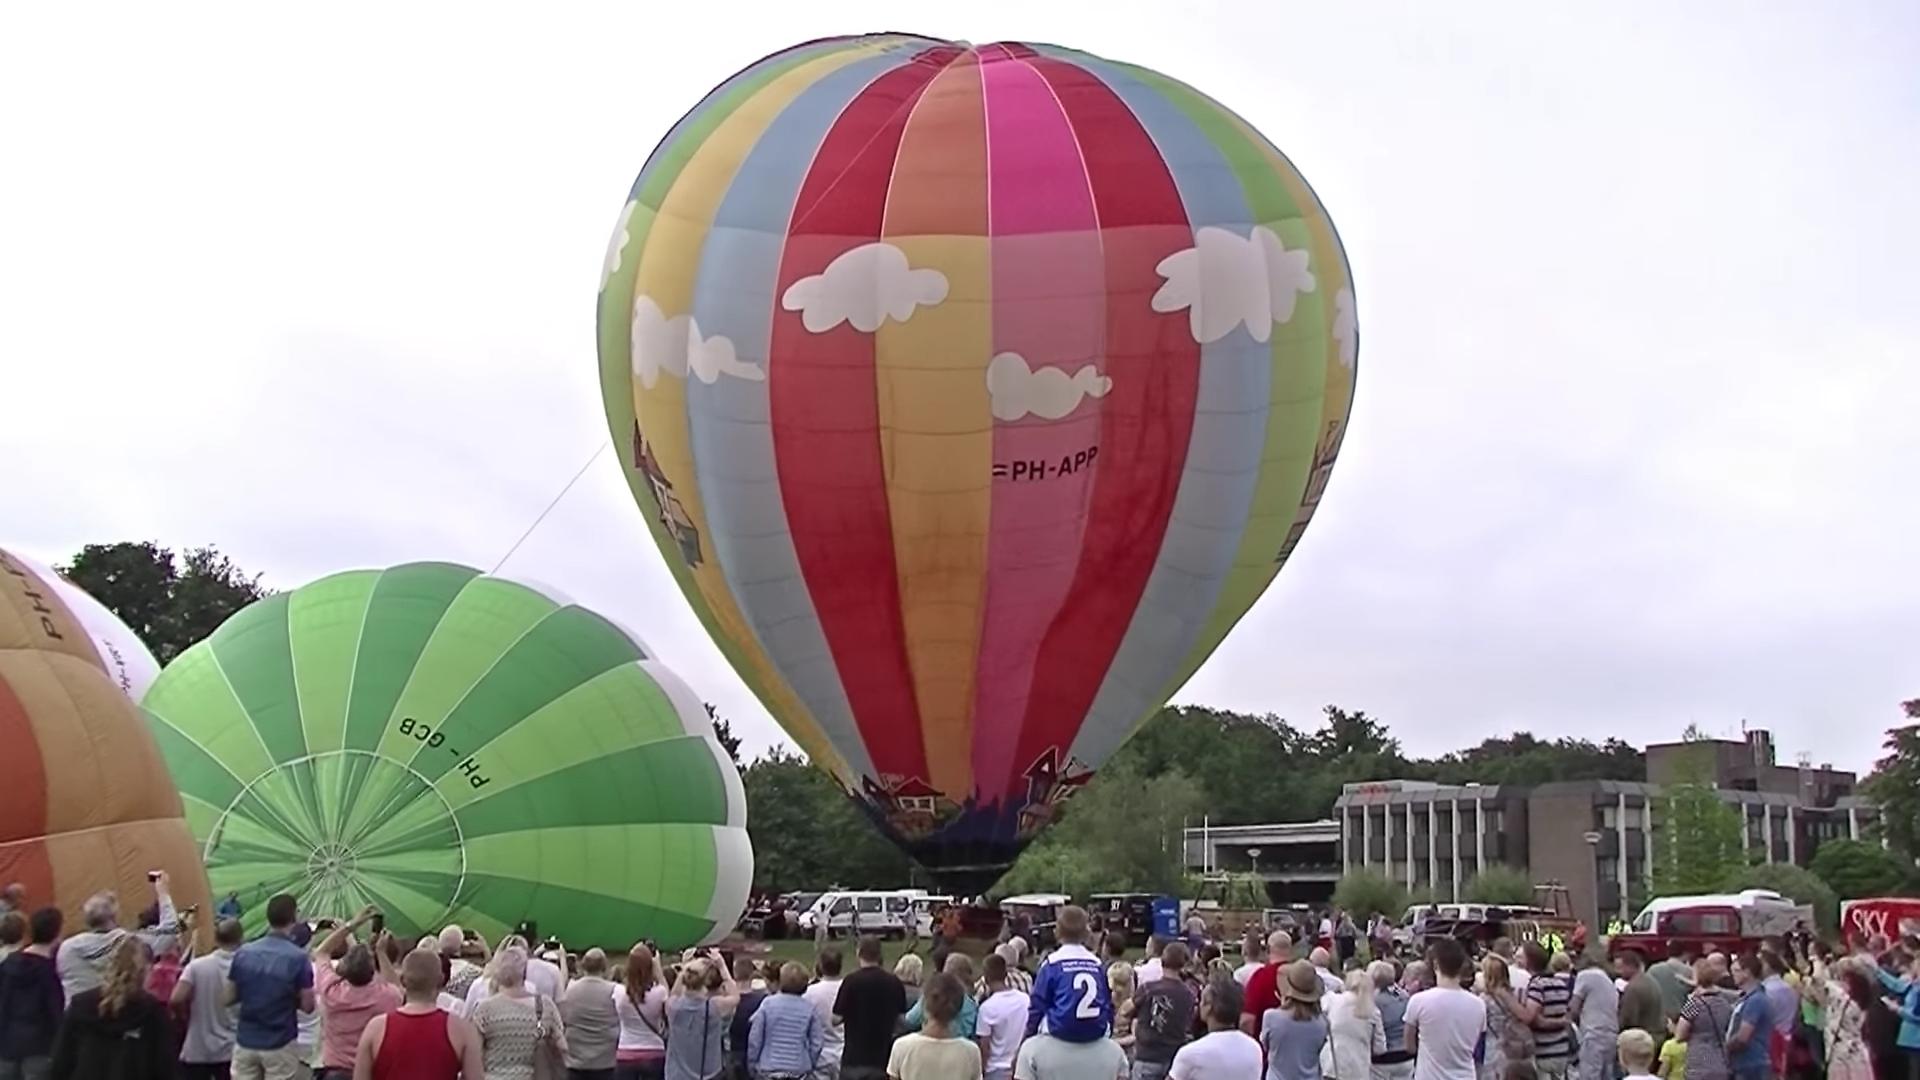 [VIDEO] Eerste Oosterhoutse ballonfestival groot succes!